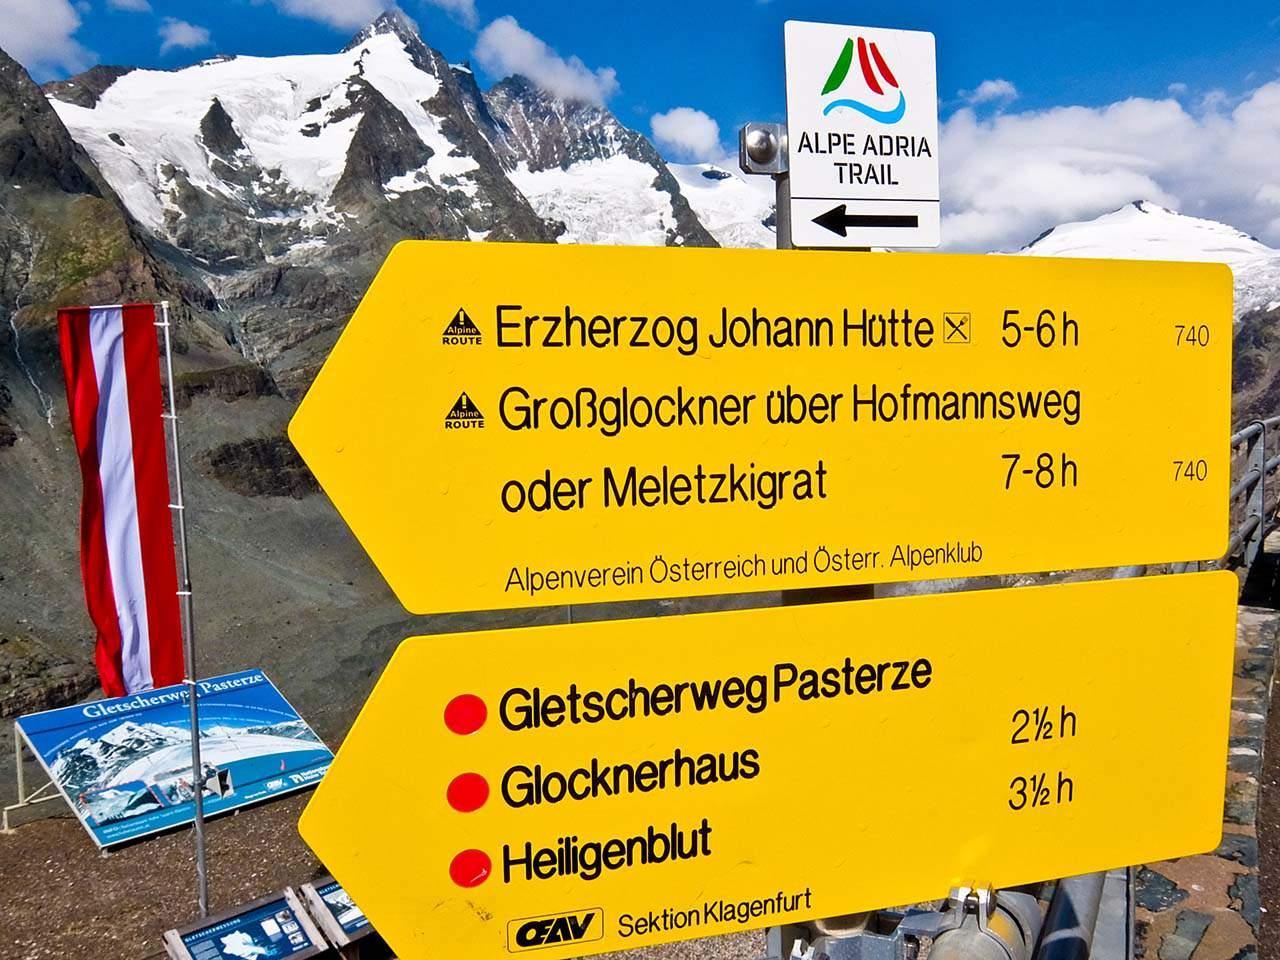 Alpe Adria - Signpost at the Pasterze Glacier, Austria